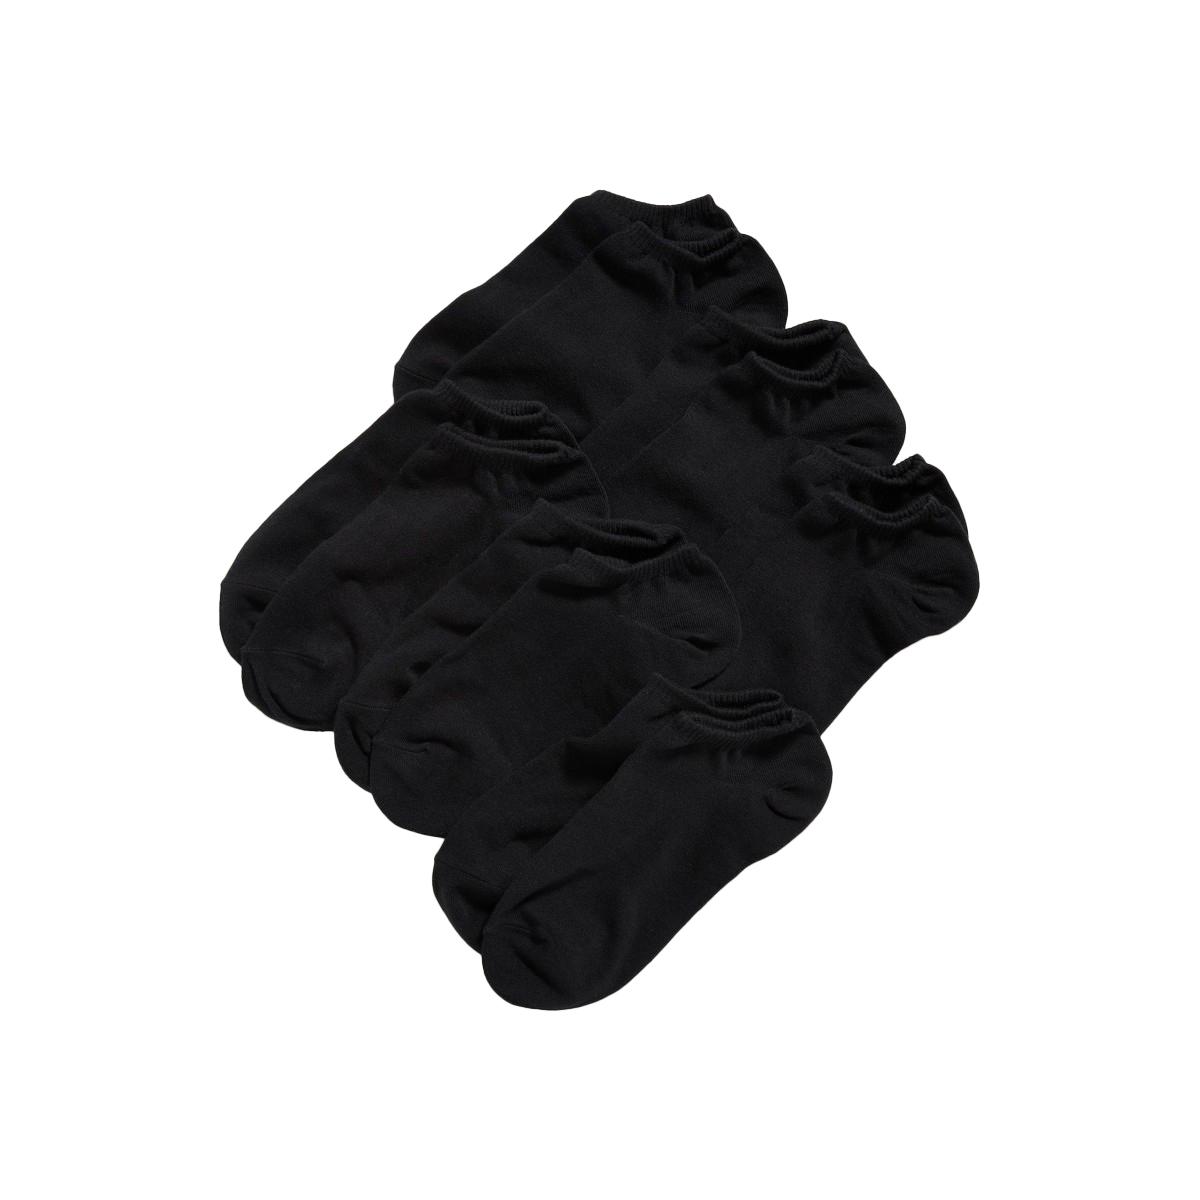 Code 6 Pairs Cotton Ankle Socks For Men Women  Cotton Ankle Socks For Men  No Show Low Cut Socks For Men  Business Casual Socks For Men - Black